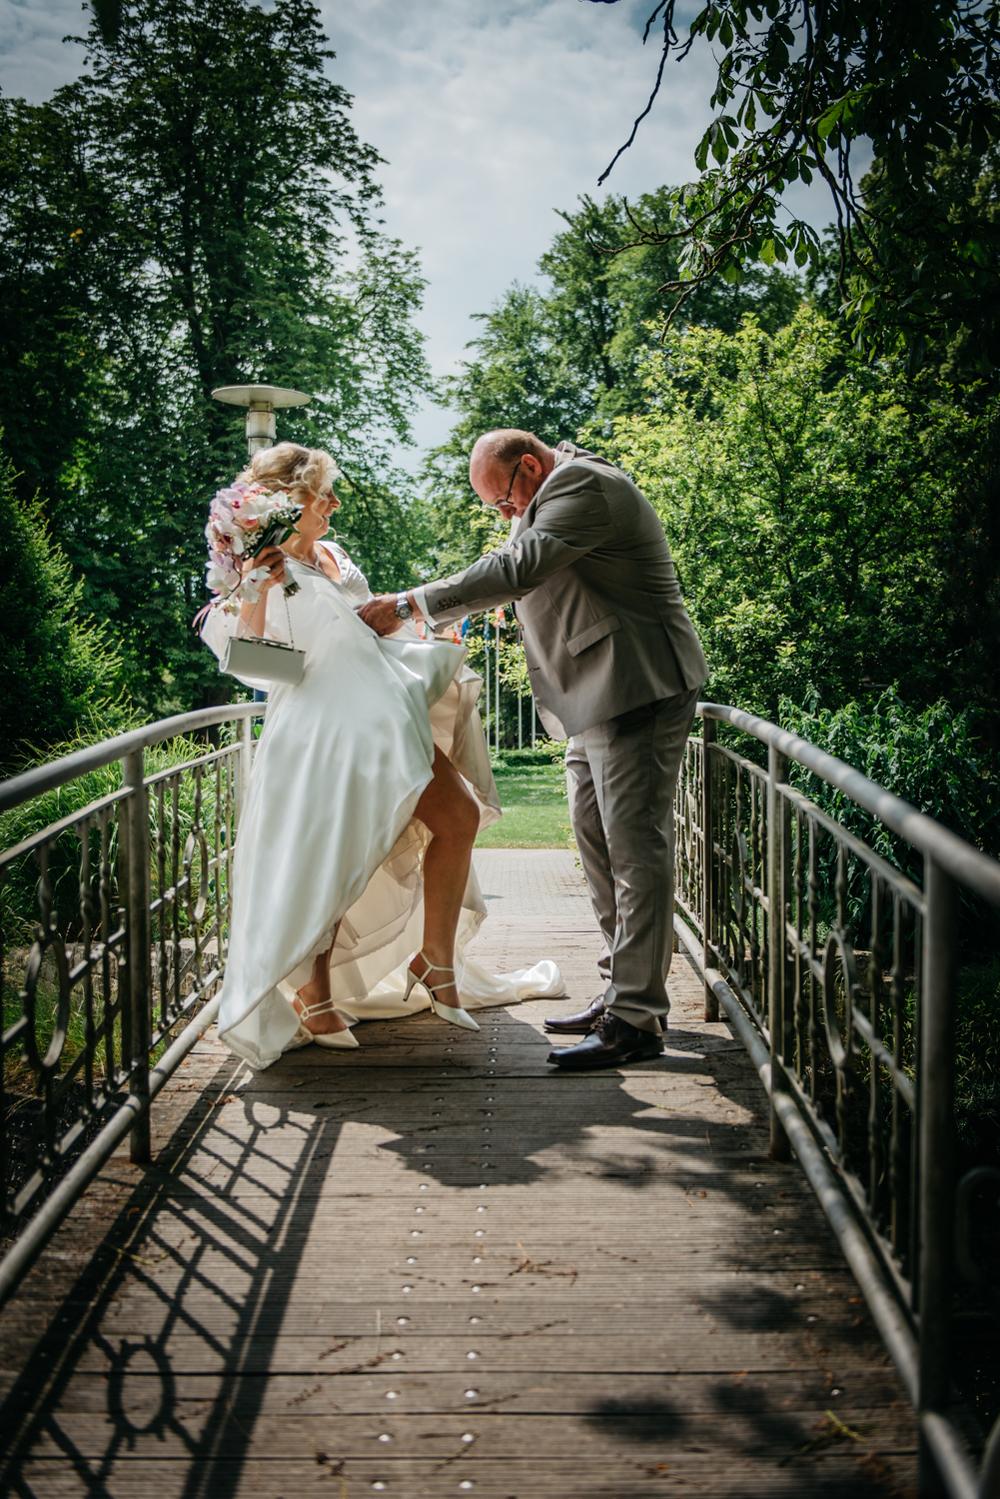 20150612 - MLDS Wedding-115-2.jpg